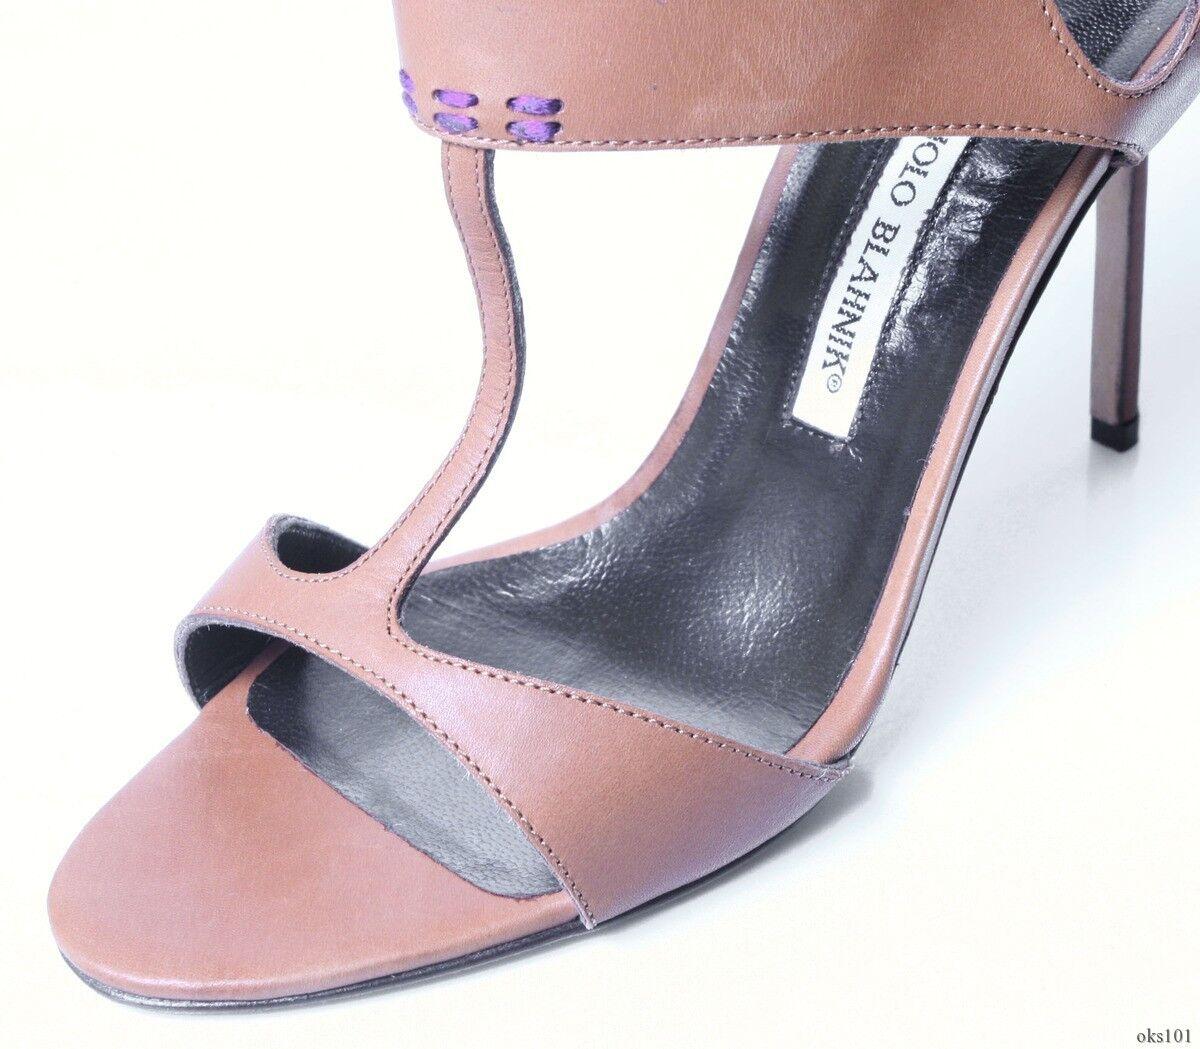 New  745 MANOLO BLAHNIK BLAHNIK BLAHNIK  Crepida  braun open-toe T-strap schuhe - SEXY a42024